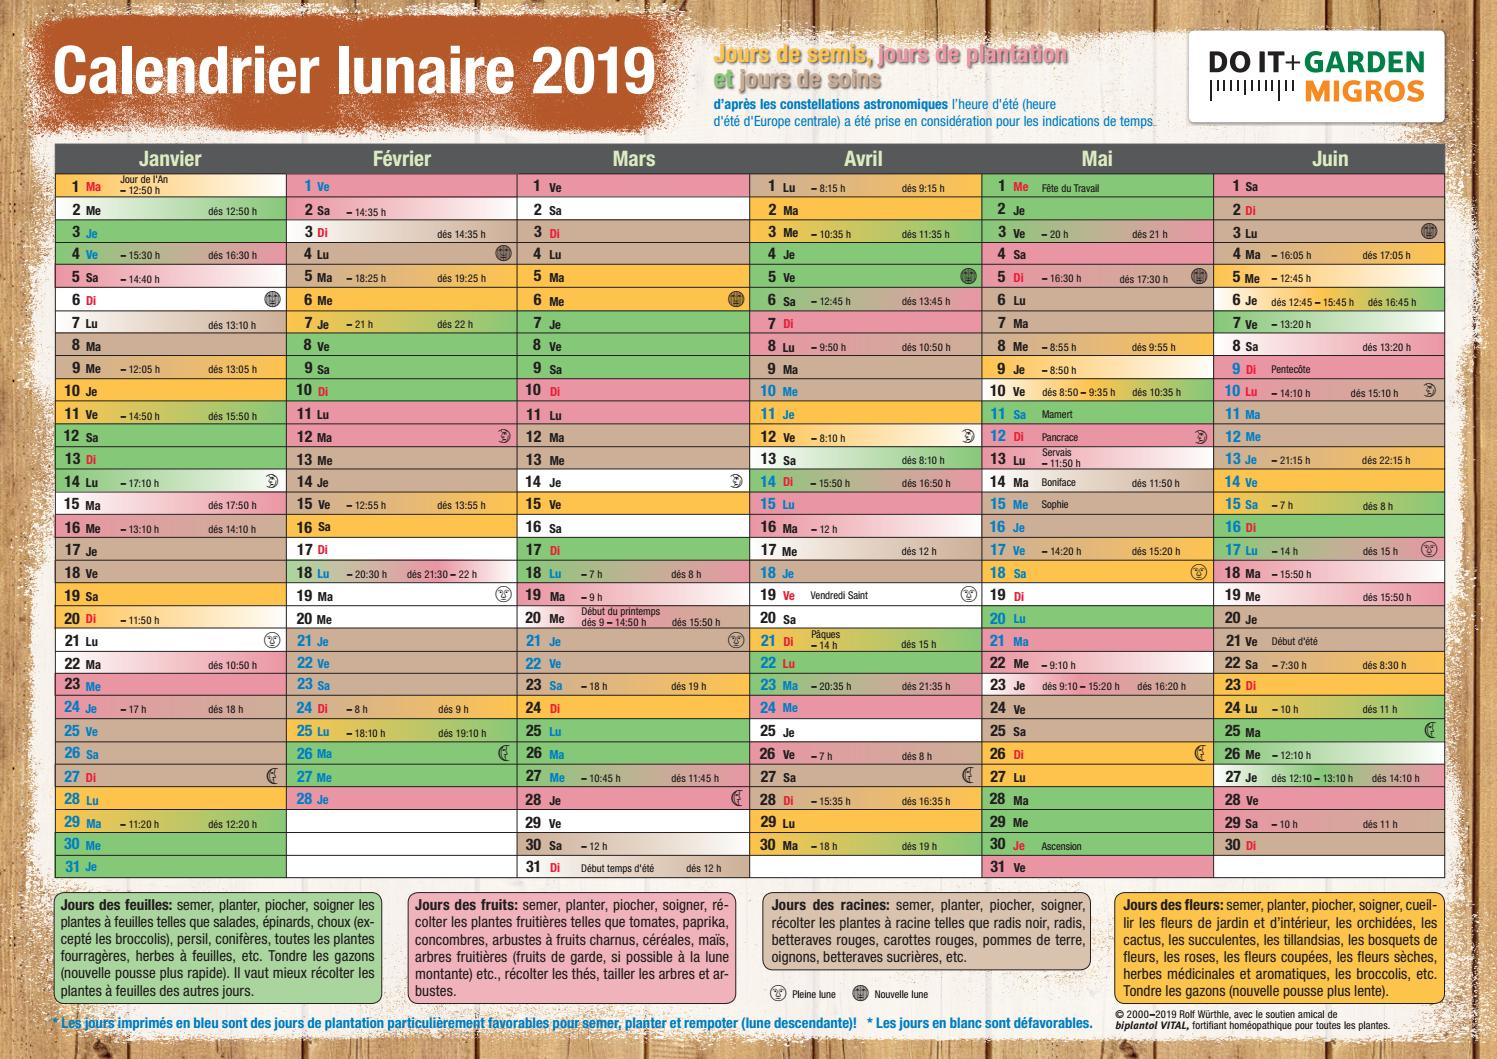 Calendrier Lunaire Jardin Avril 2020.Doit Mondkalender 2019 Fr By Migros Issuu